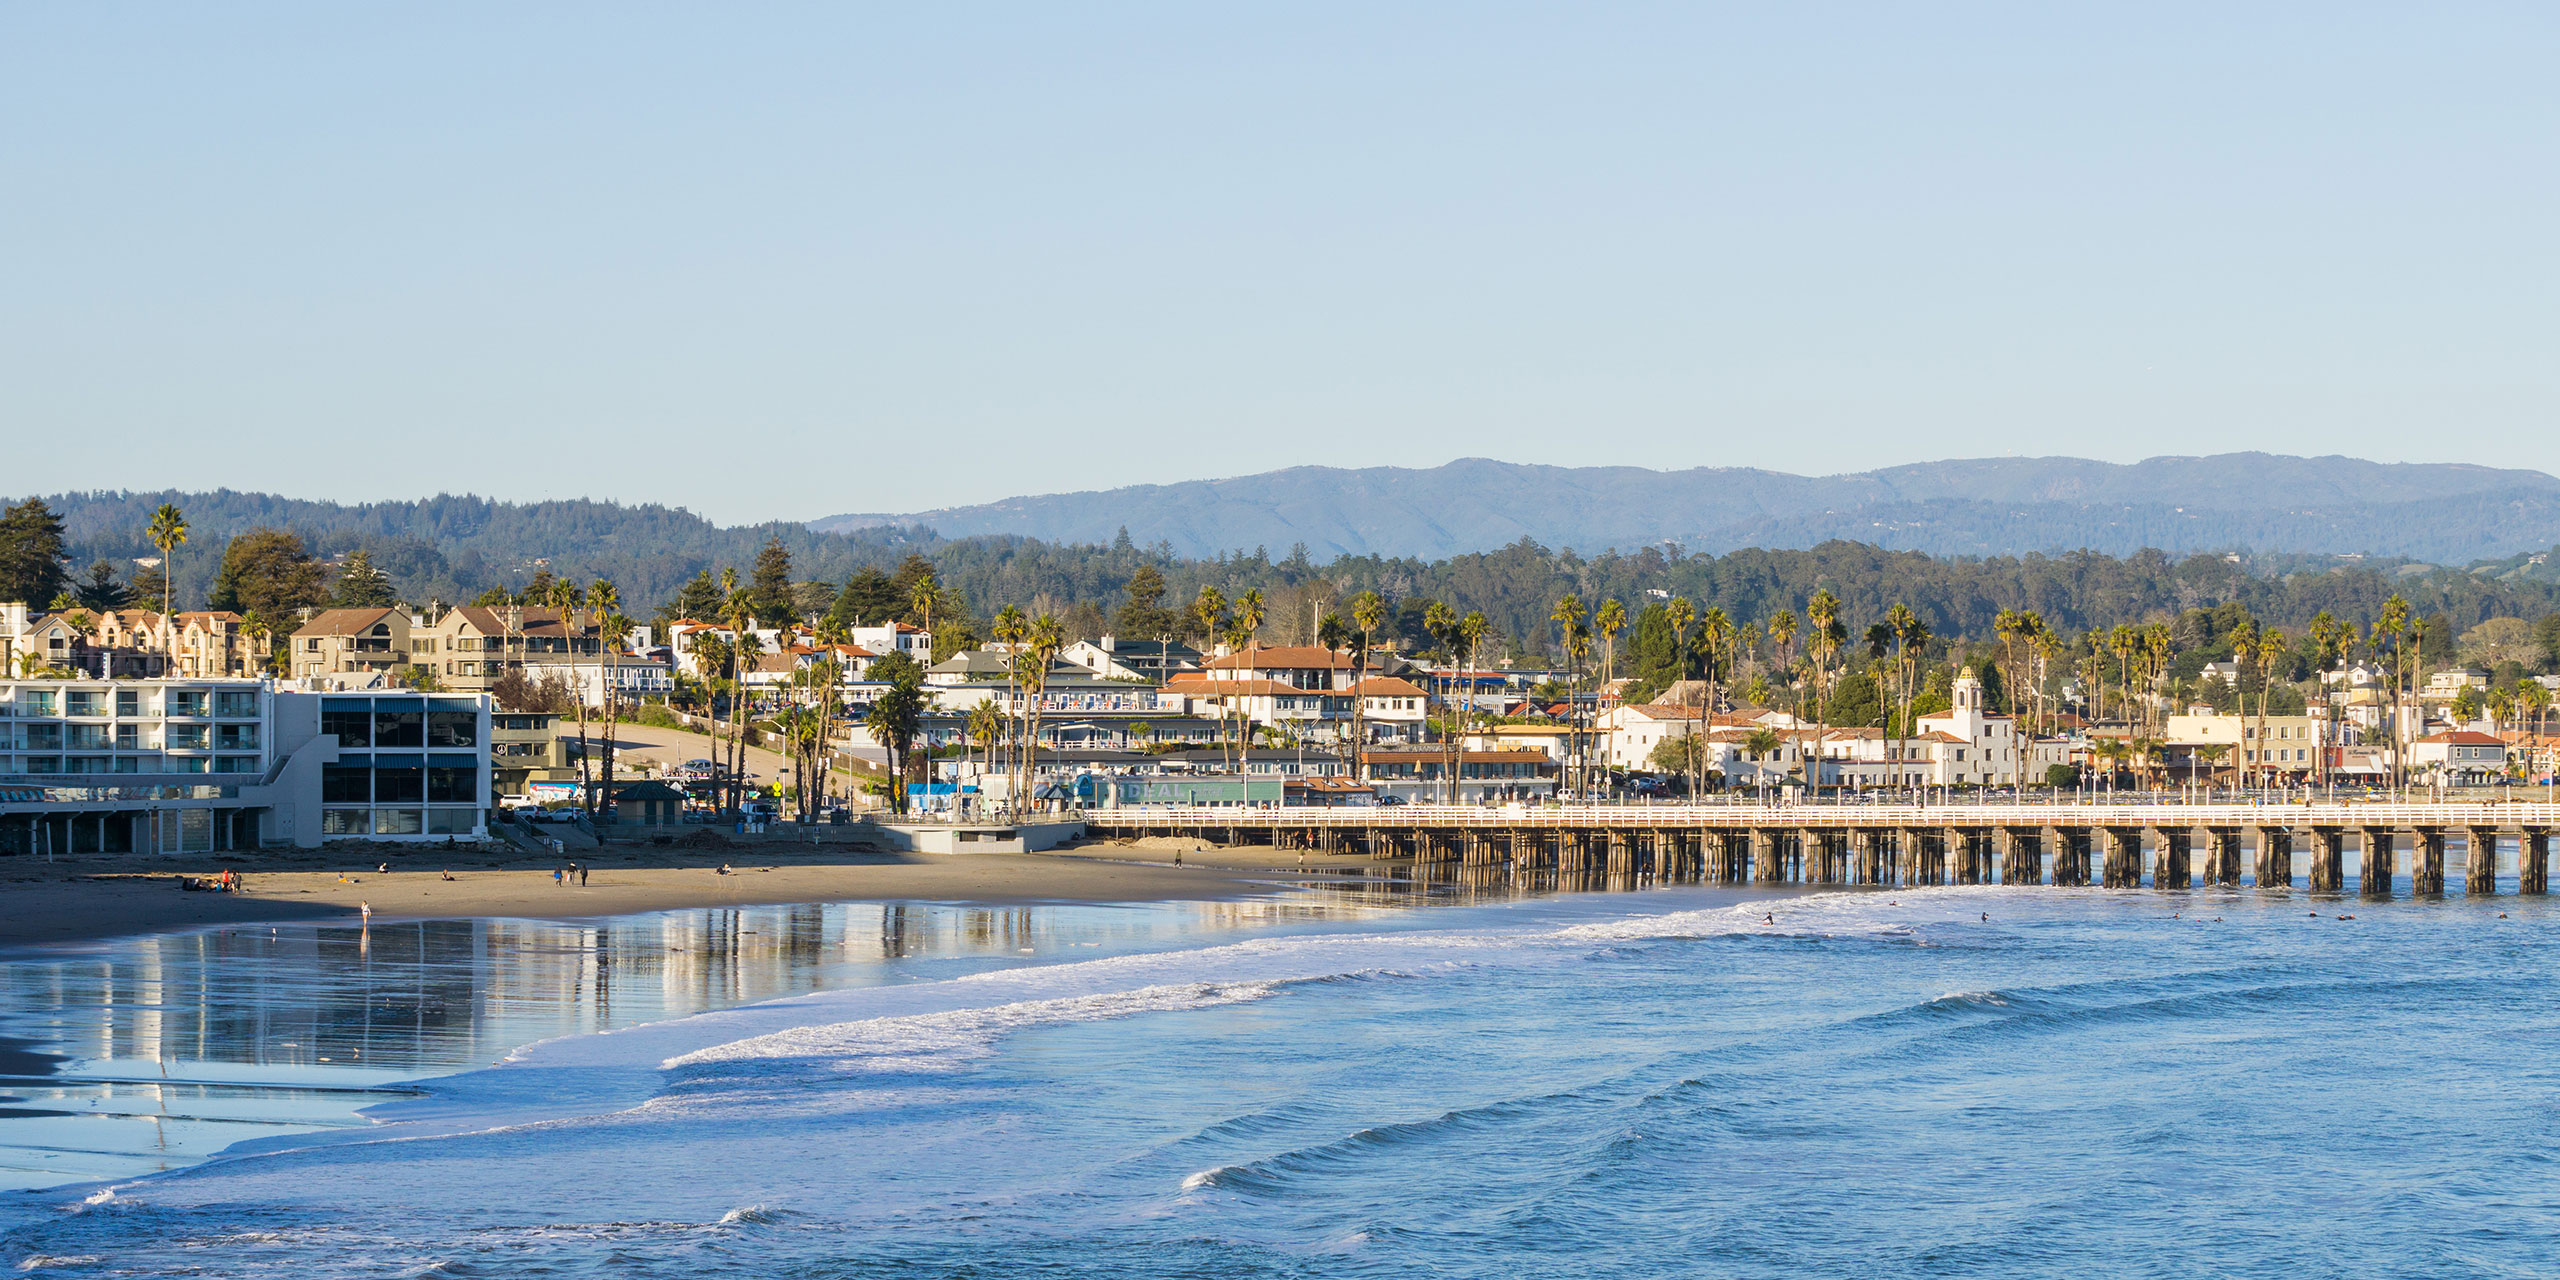 Santa Cruz, California; Courtesy of Sundry Photography/Shutterstock.com